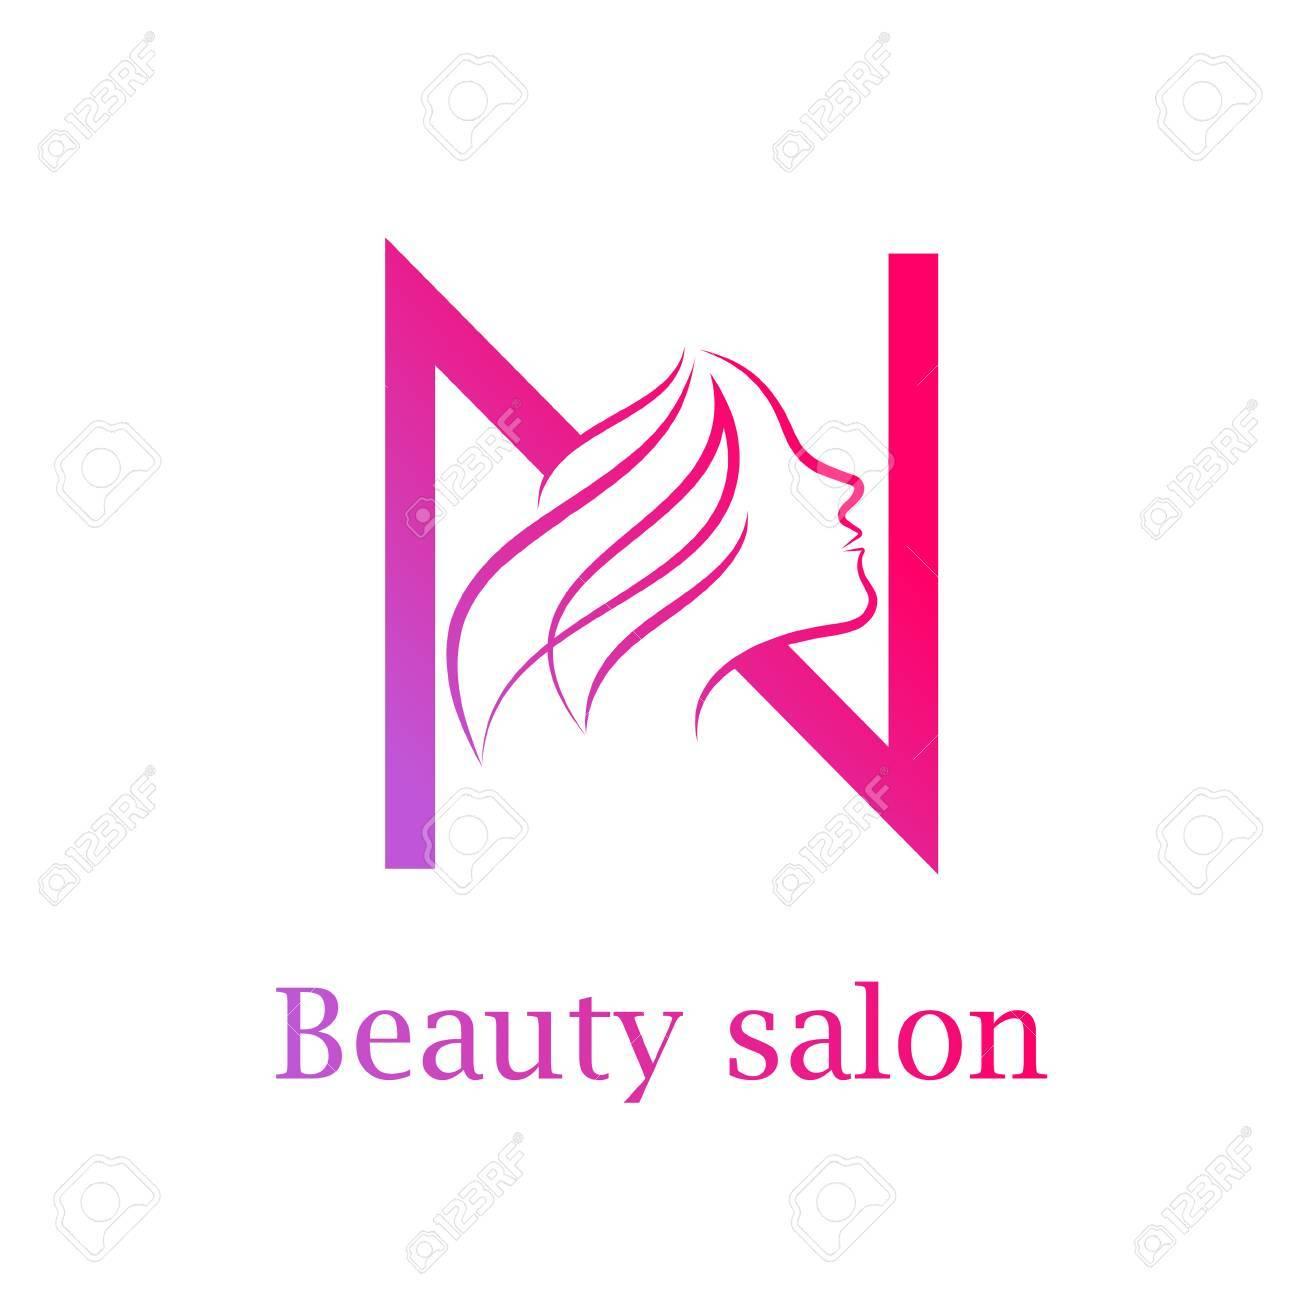 Abstract letter n logobeauty salon logo design template royalty abstract letter n logobeauty salon logo design template stock vector 84733907 maxwellsz